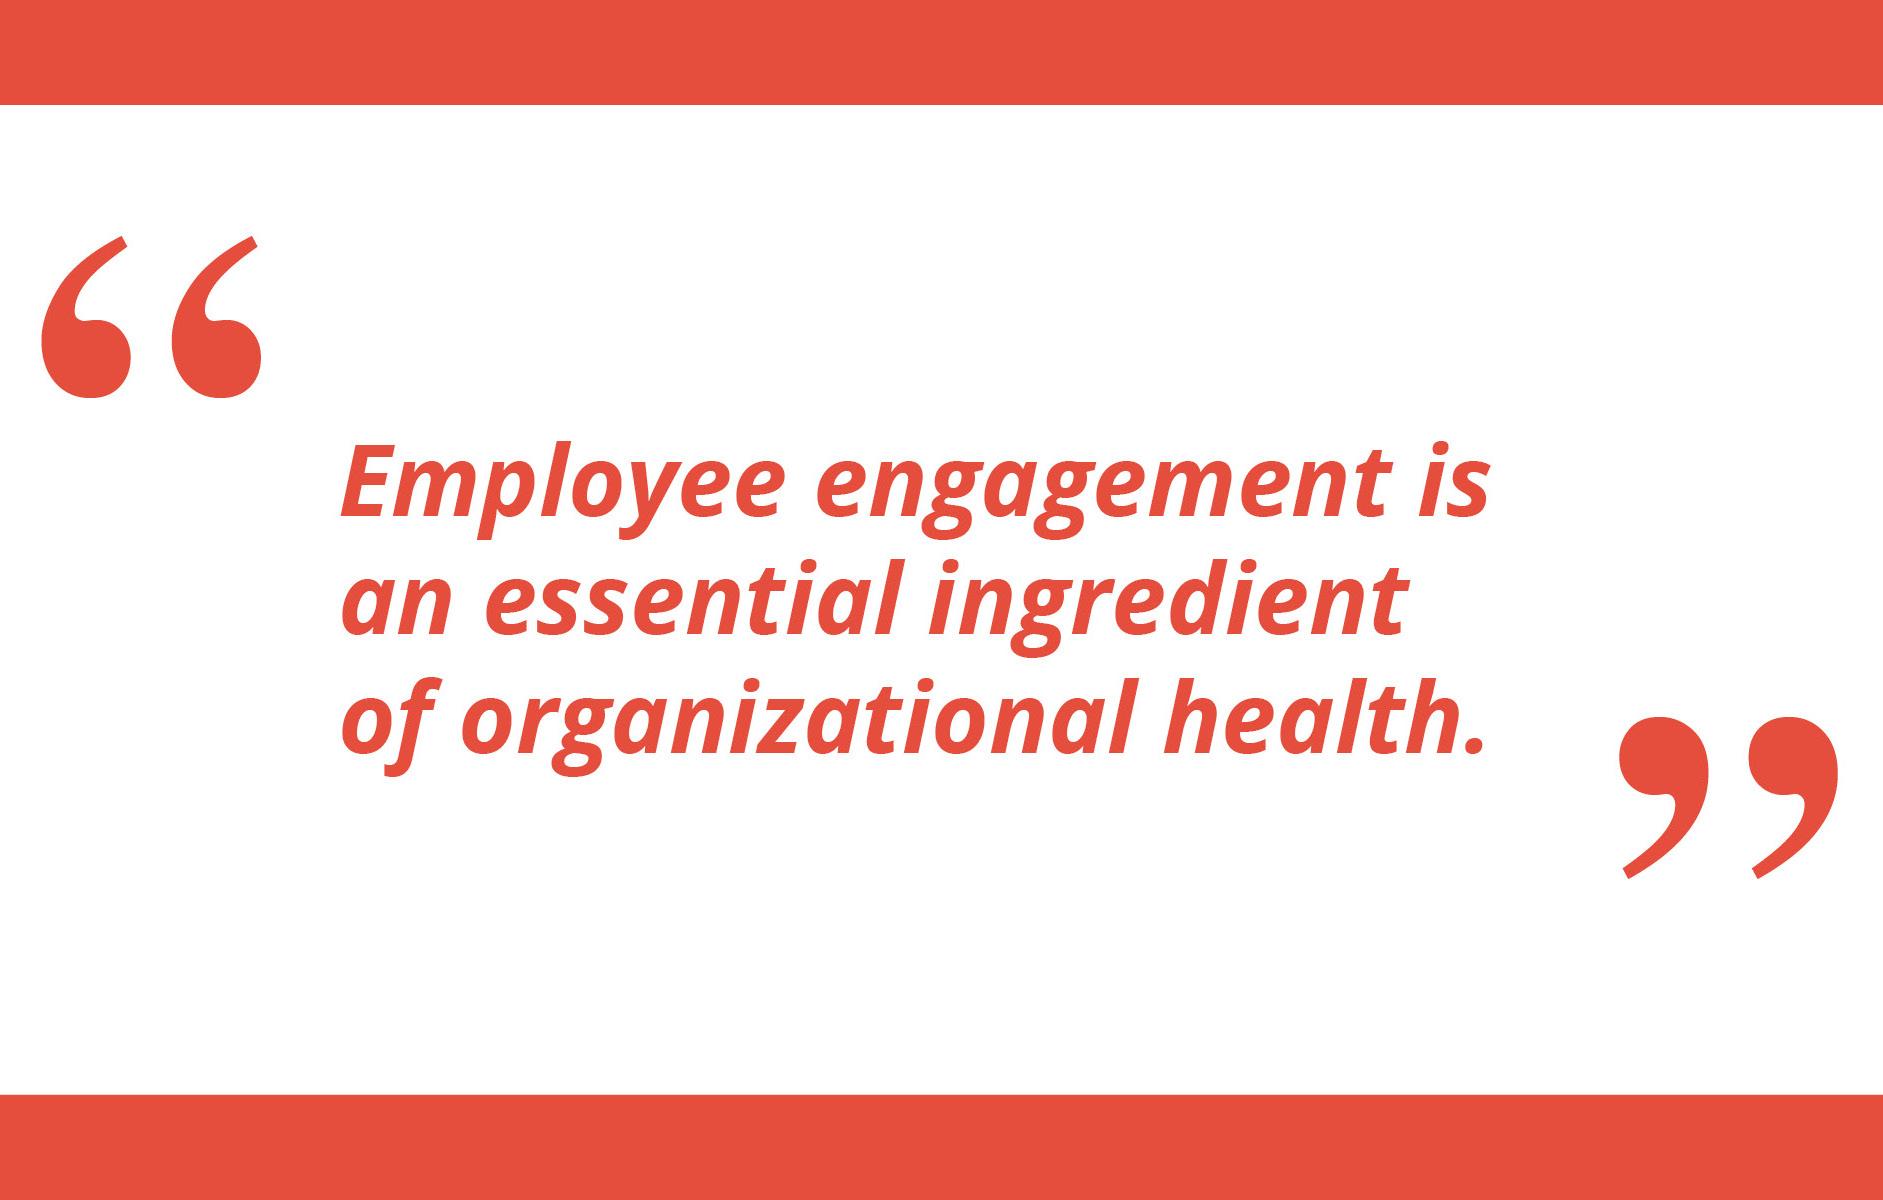 employee engagement quote 2.jpg